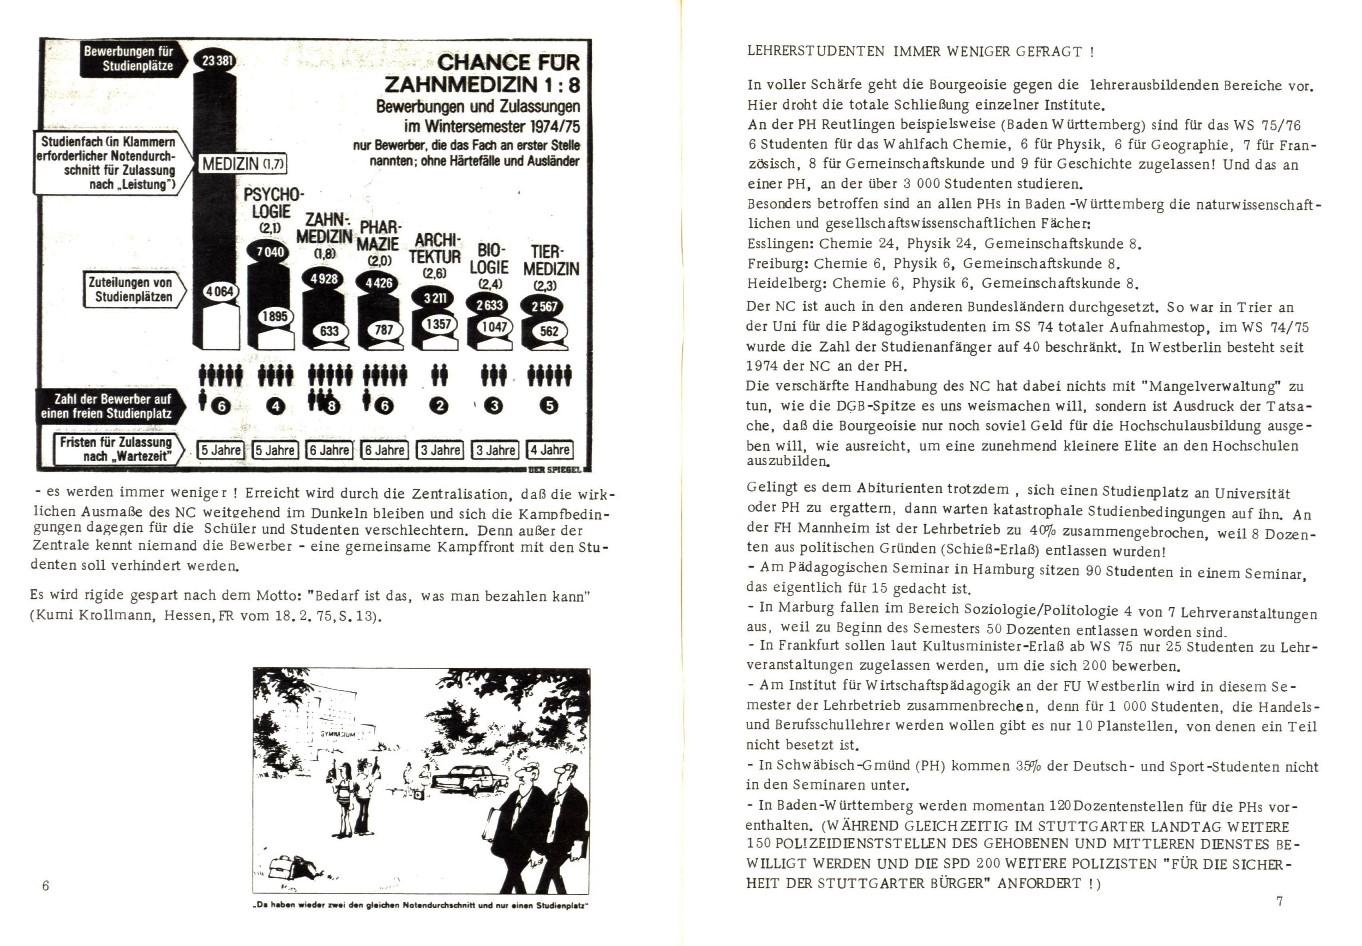 KSV_1975_Lehrerausbildung_04